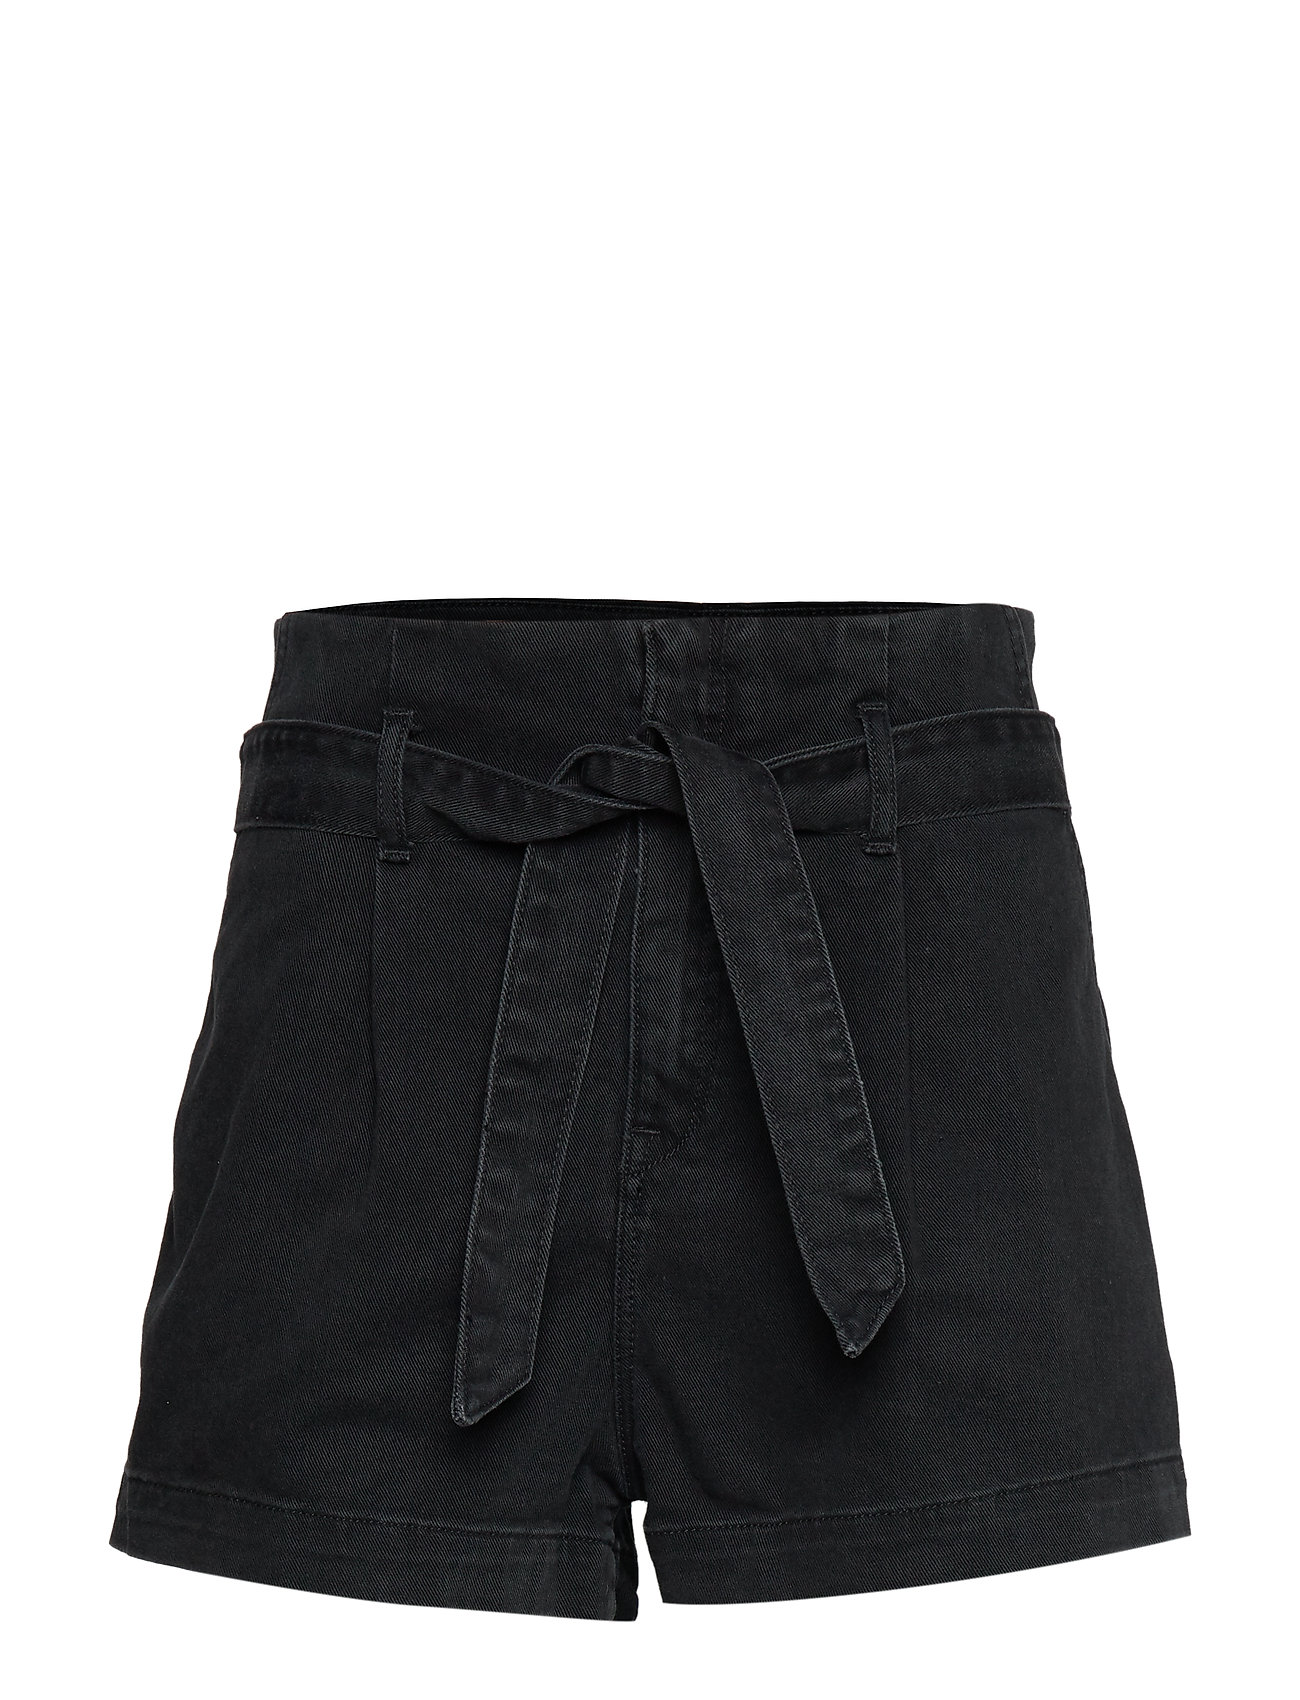 Replay Shorts - BLACK